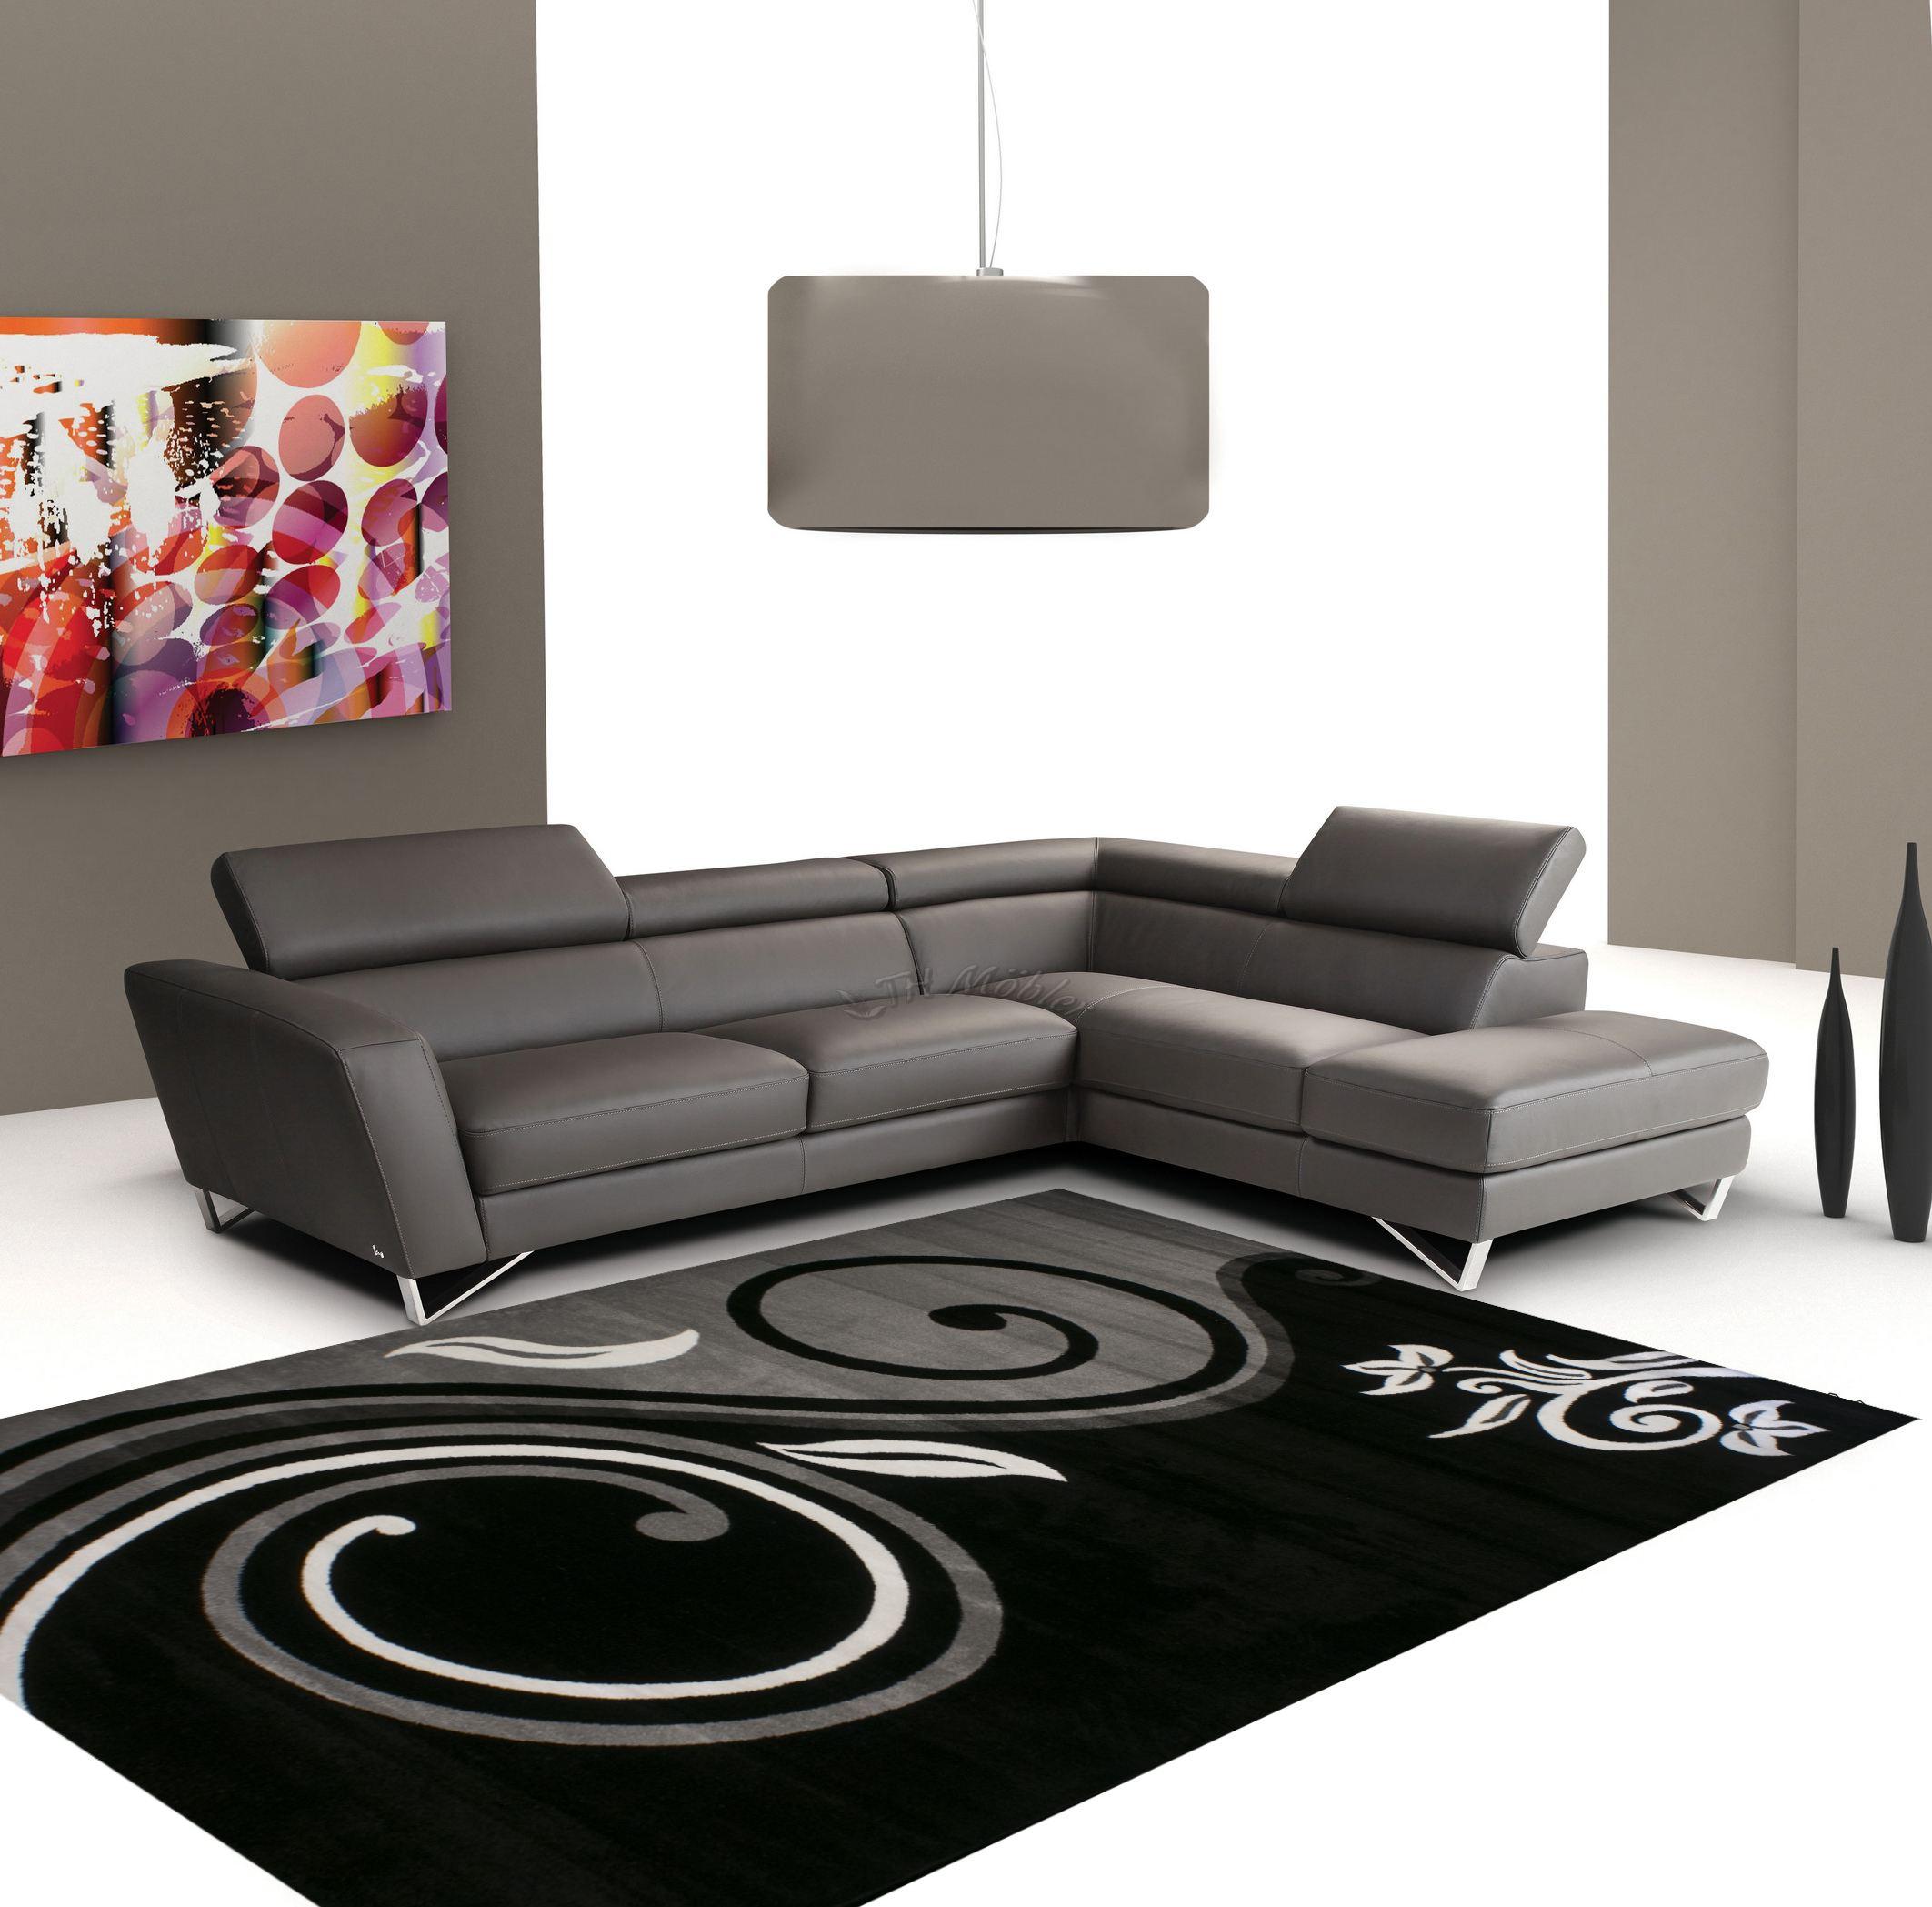 th m bler villa 104 matta svart gr 200 290. Black Bedroom Furniture Sets. Home Design Ideas